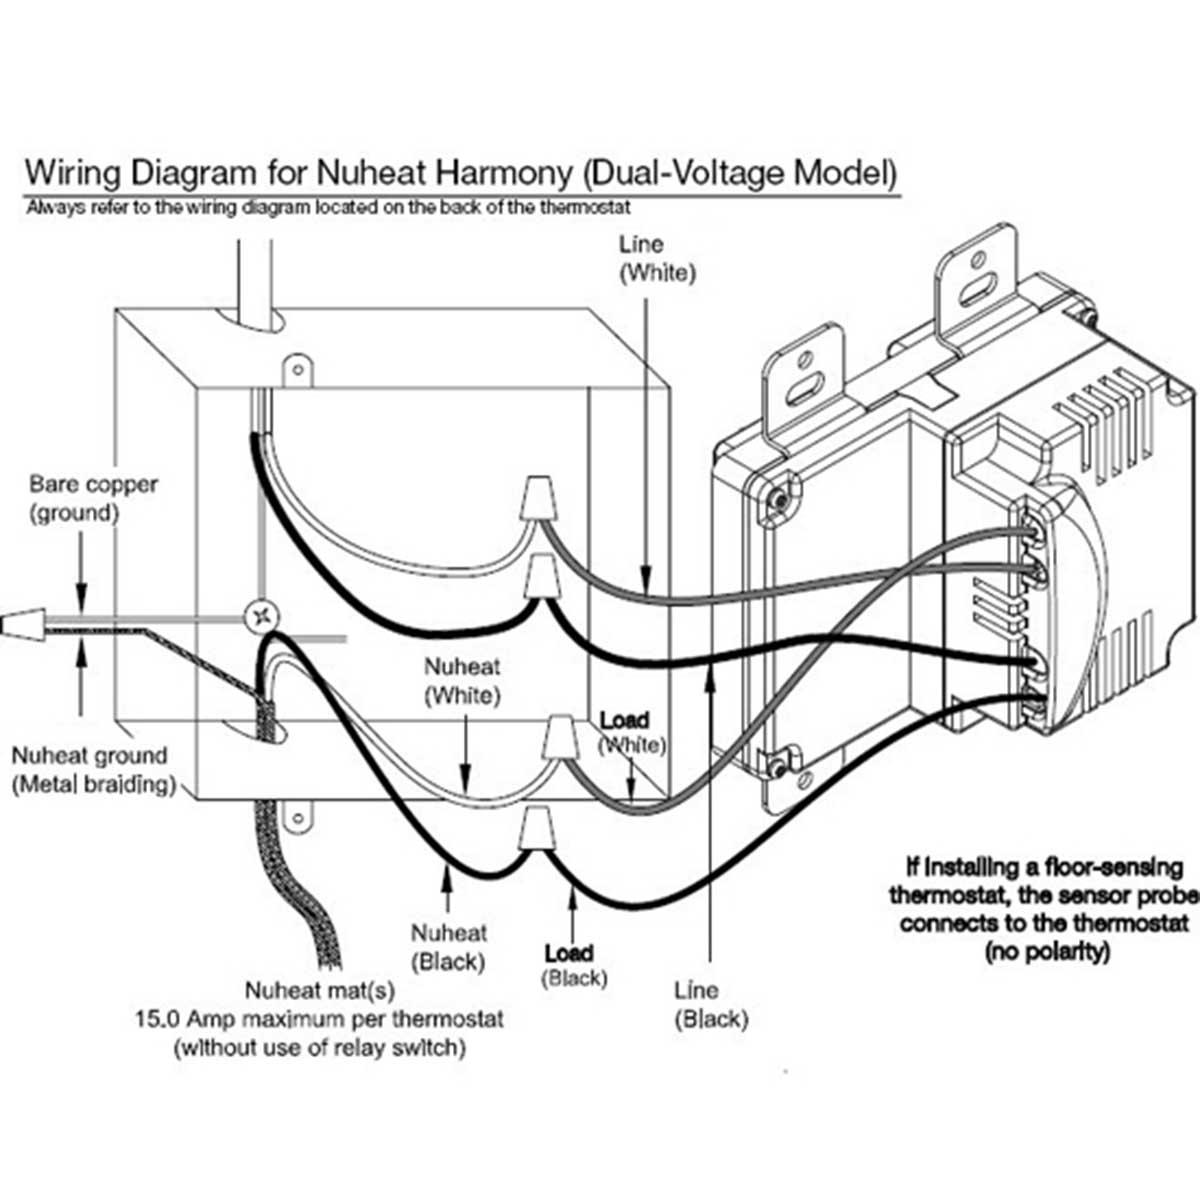 hight resolution of nuheat floor heating manual pictures